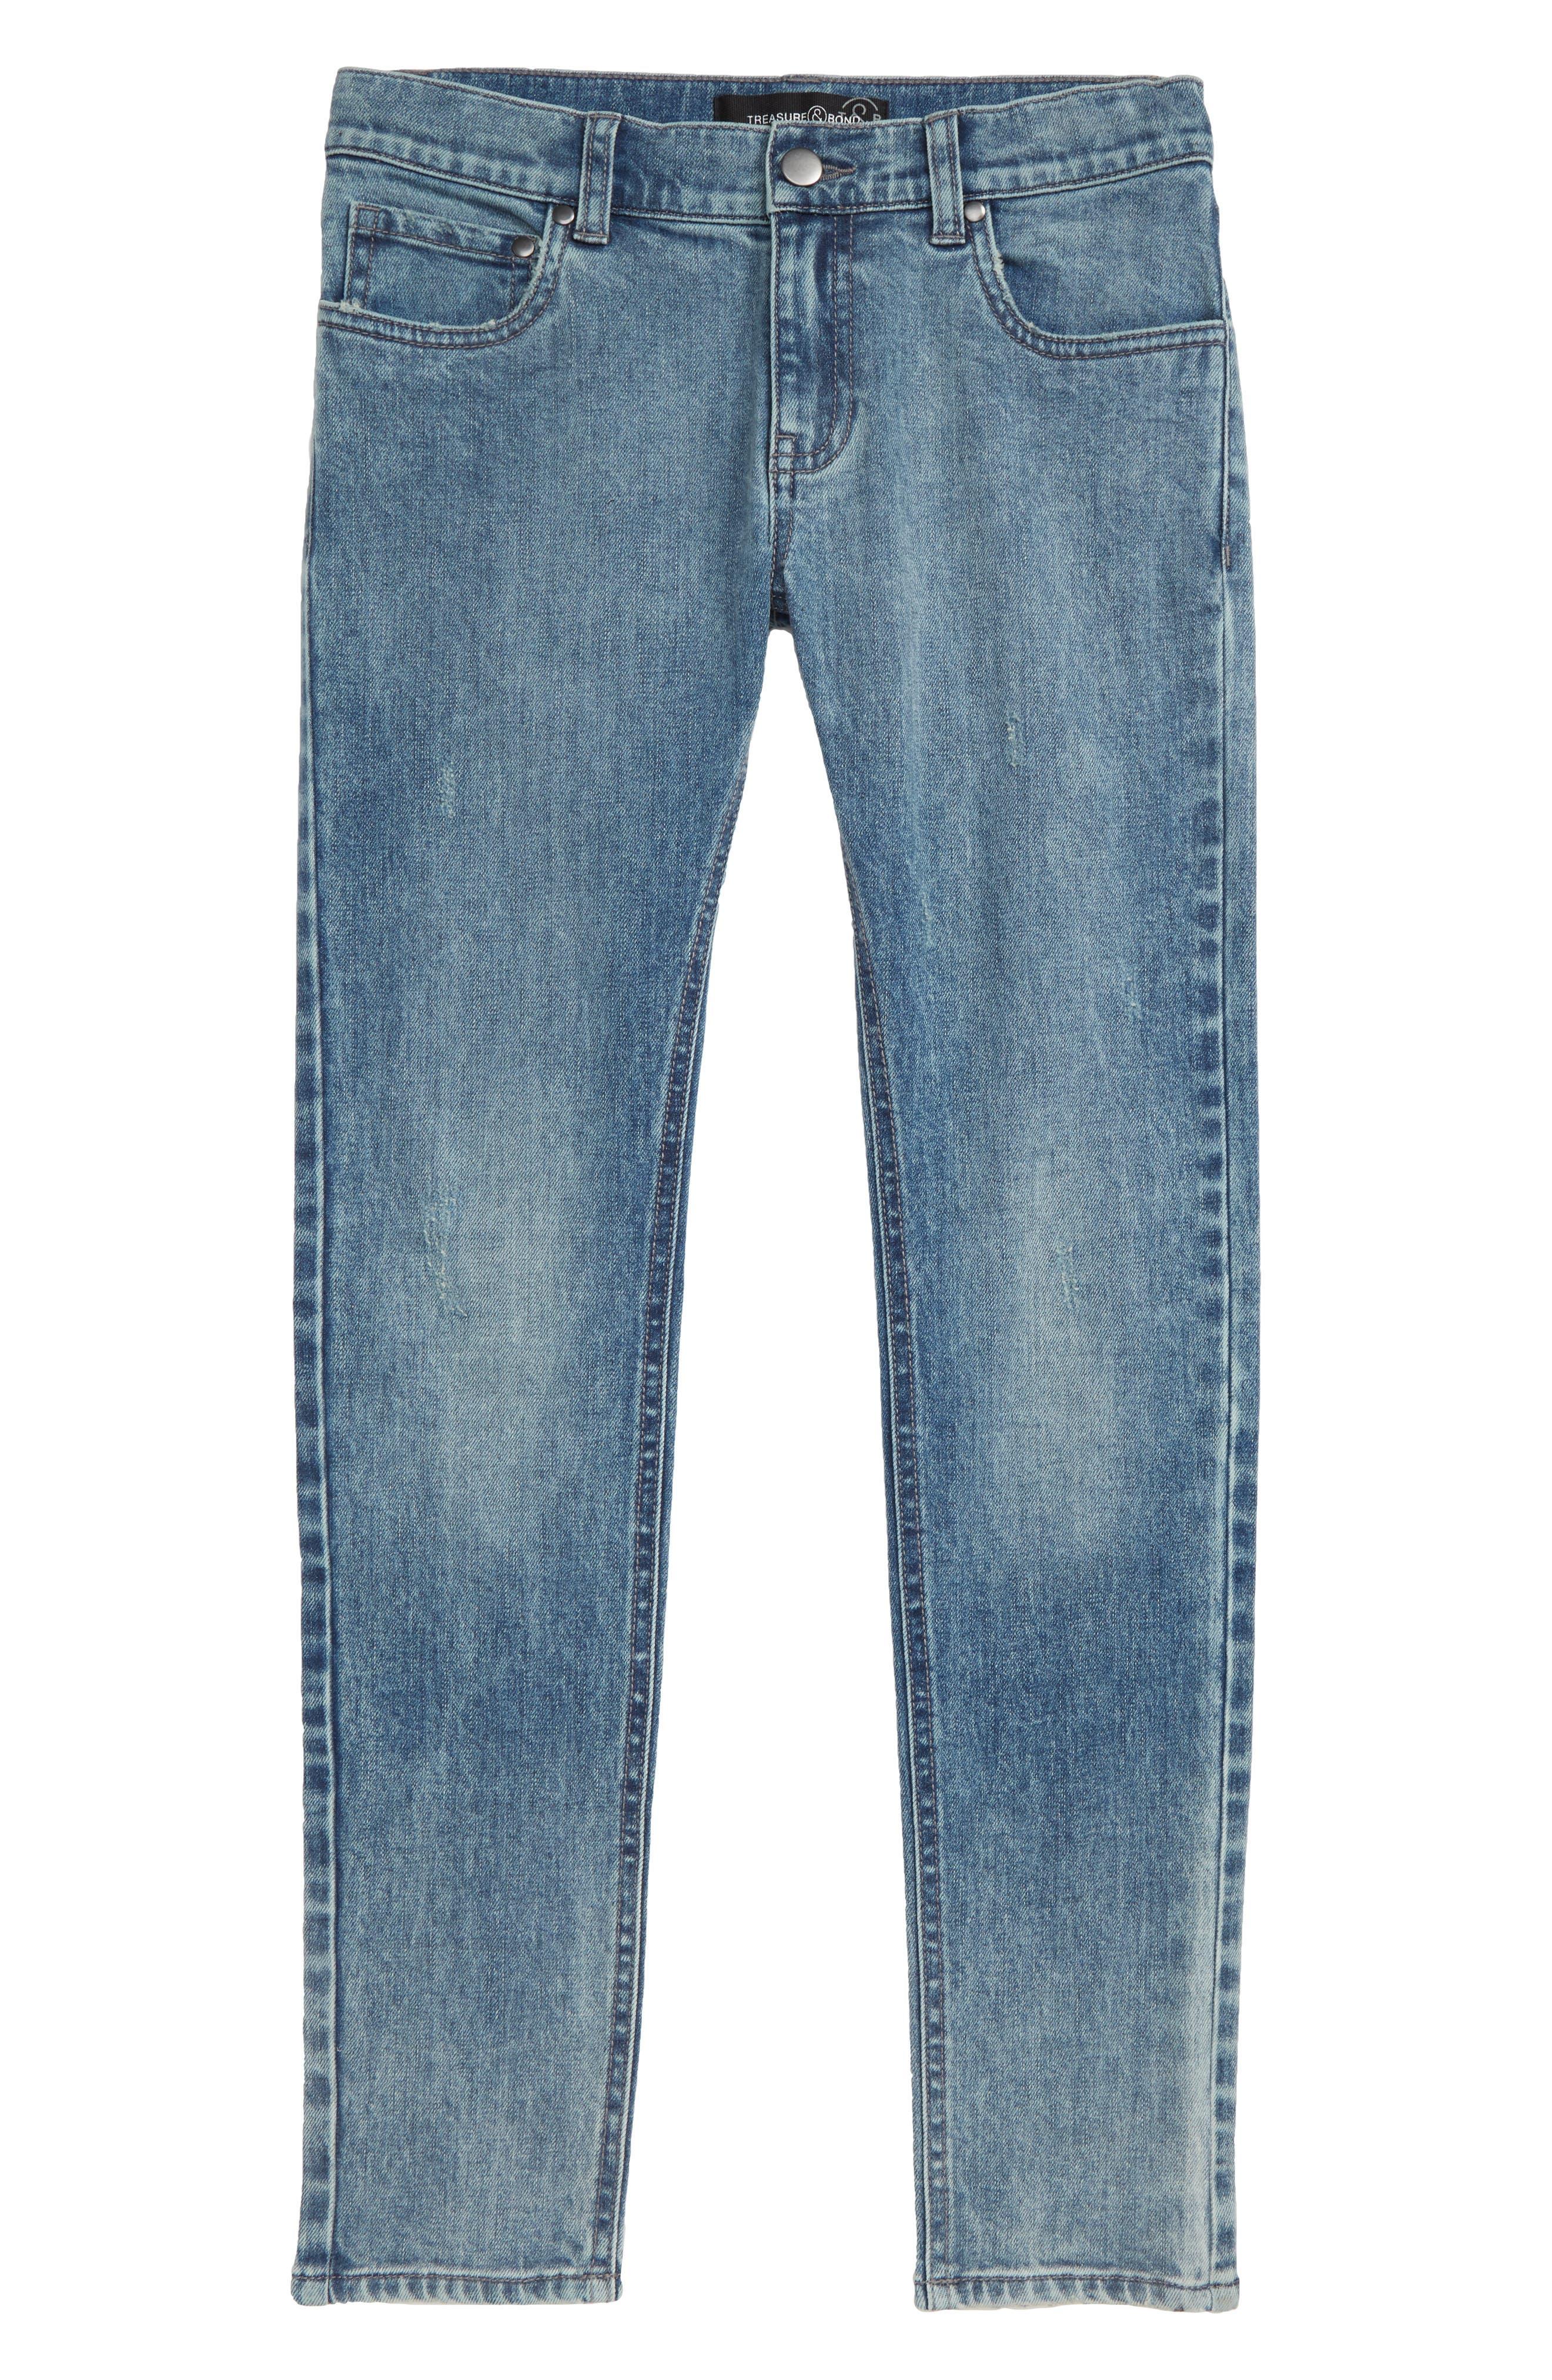 Treaure & Bond Light Wash Jeans,                         Main,                         color, ACID FADE WASH